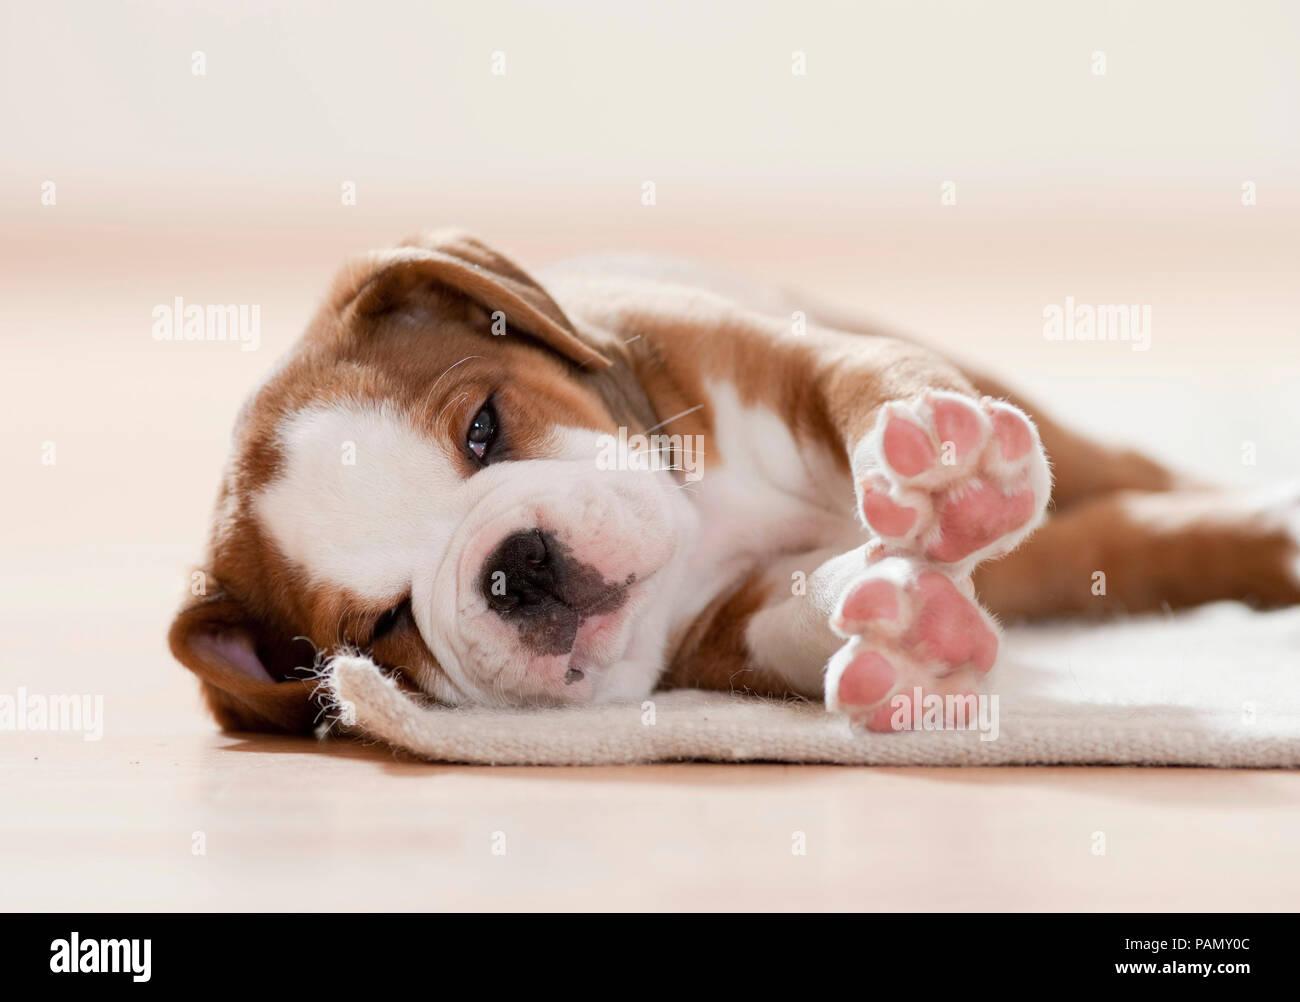 Continental Bulldog. Puppy dozing on a rug. Germany - Stock Image